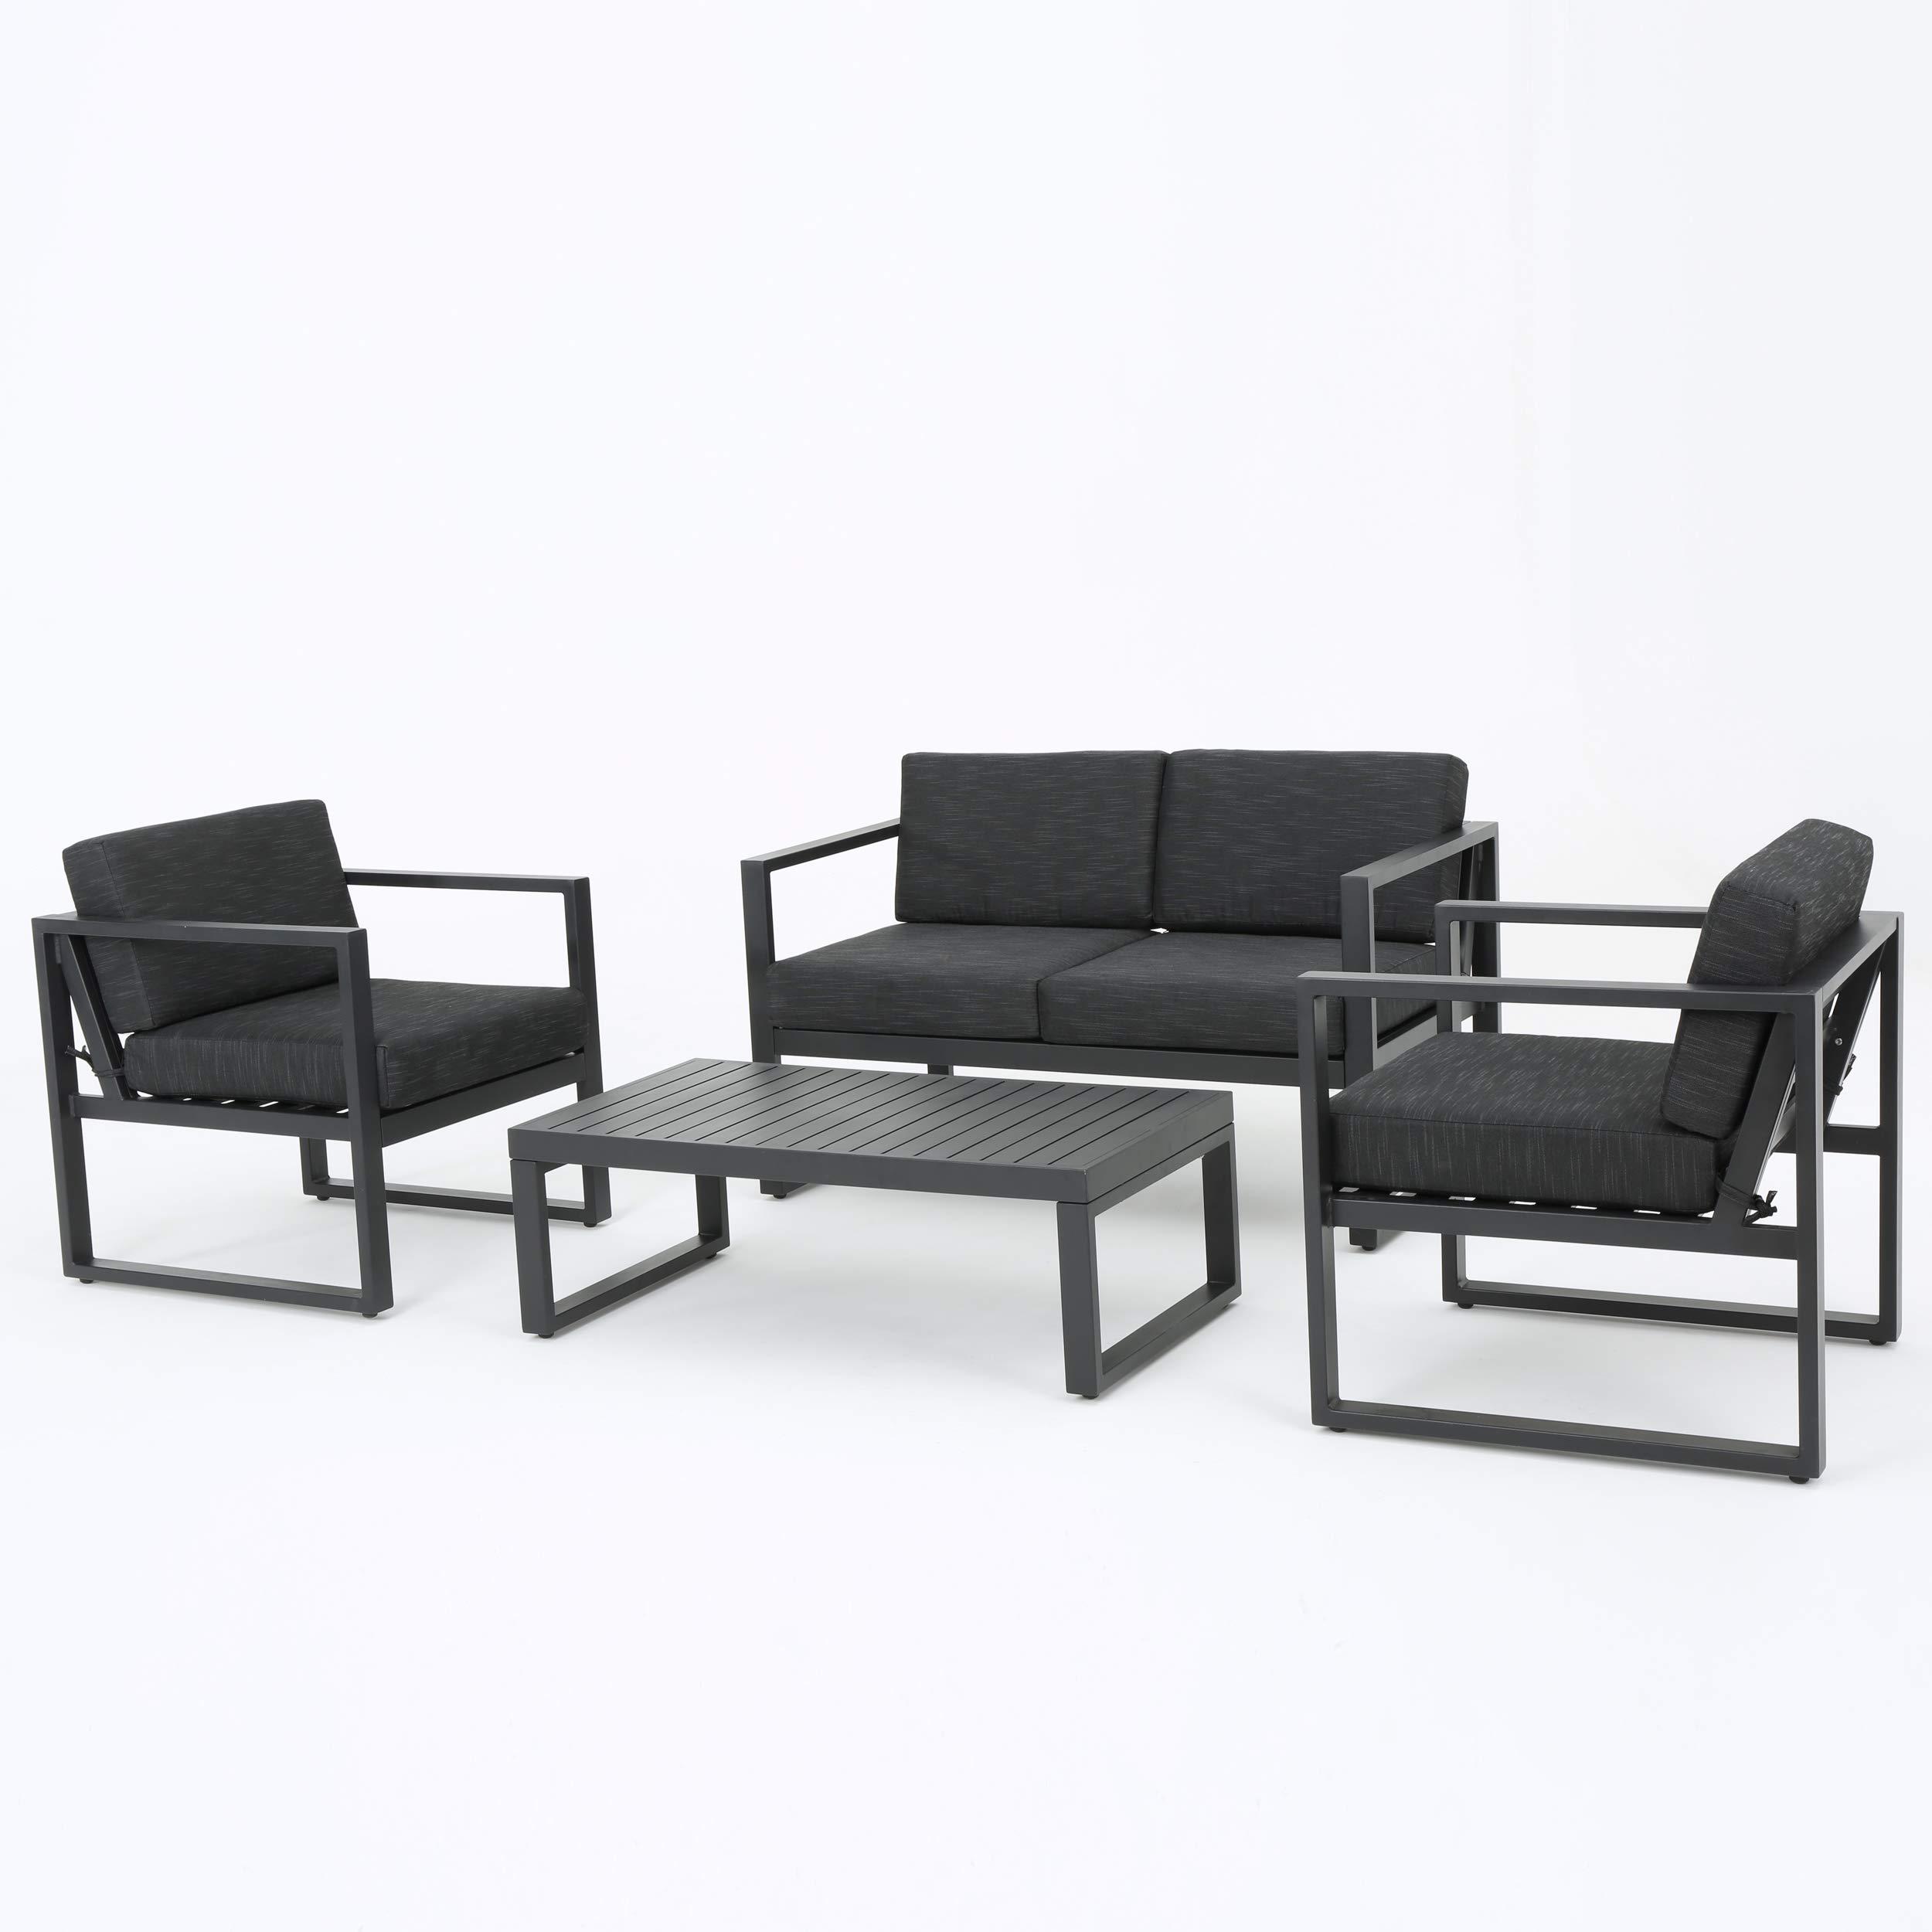 GDF Studio Nealie Patio Furniture ~ 4 Piece Outdoor Aluminum Chat Set (Dark Grey)